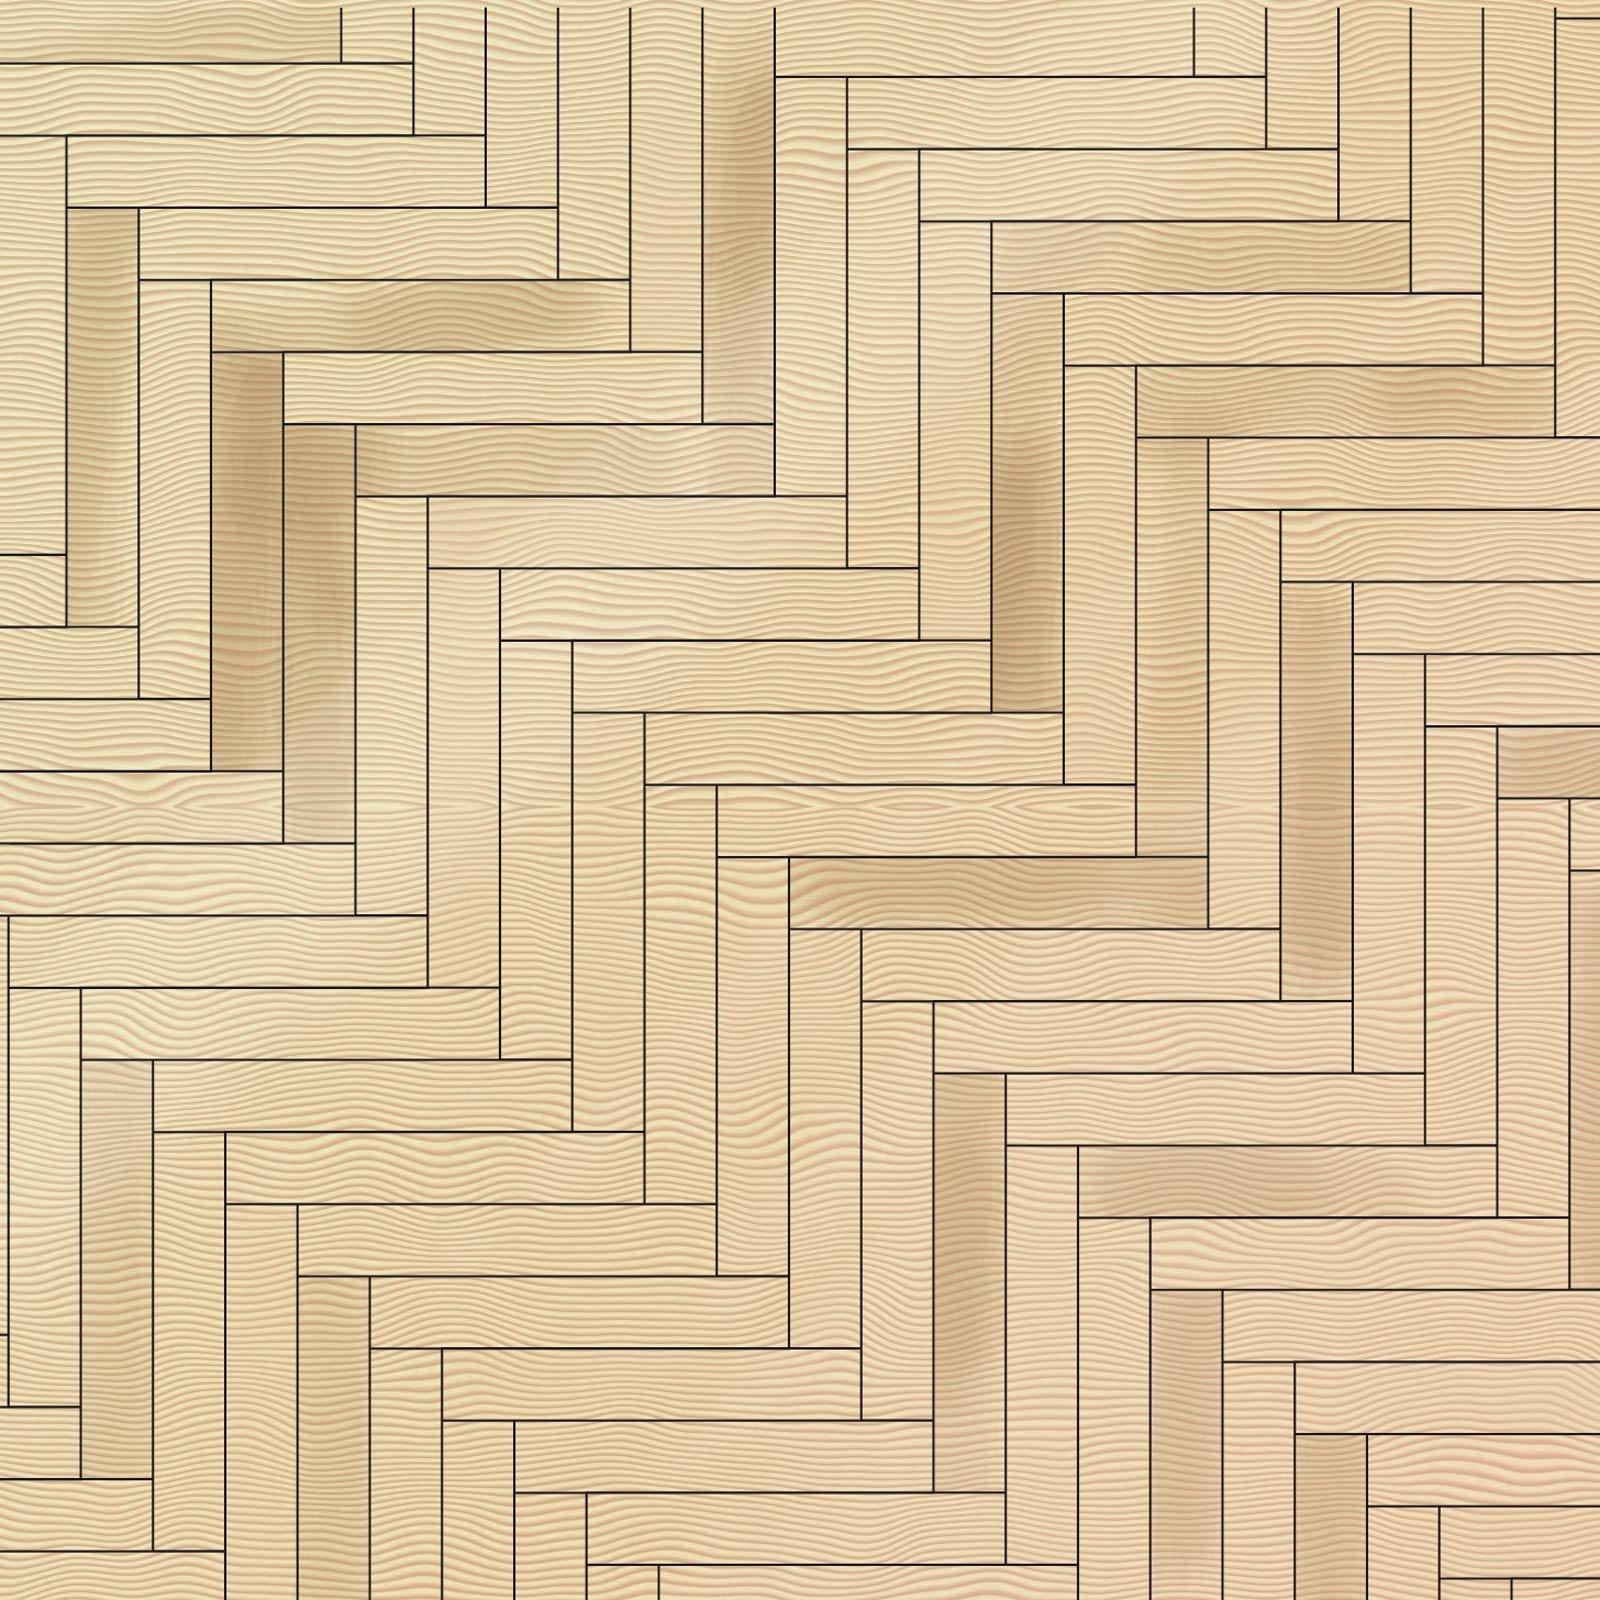 Posa Parquet Orizzontale O Verticale parquet: geometrie e tipi di posa - cose di casa